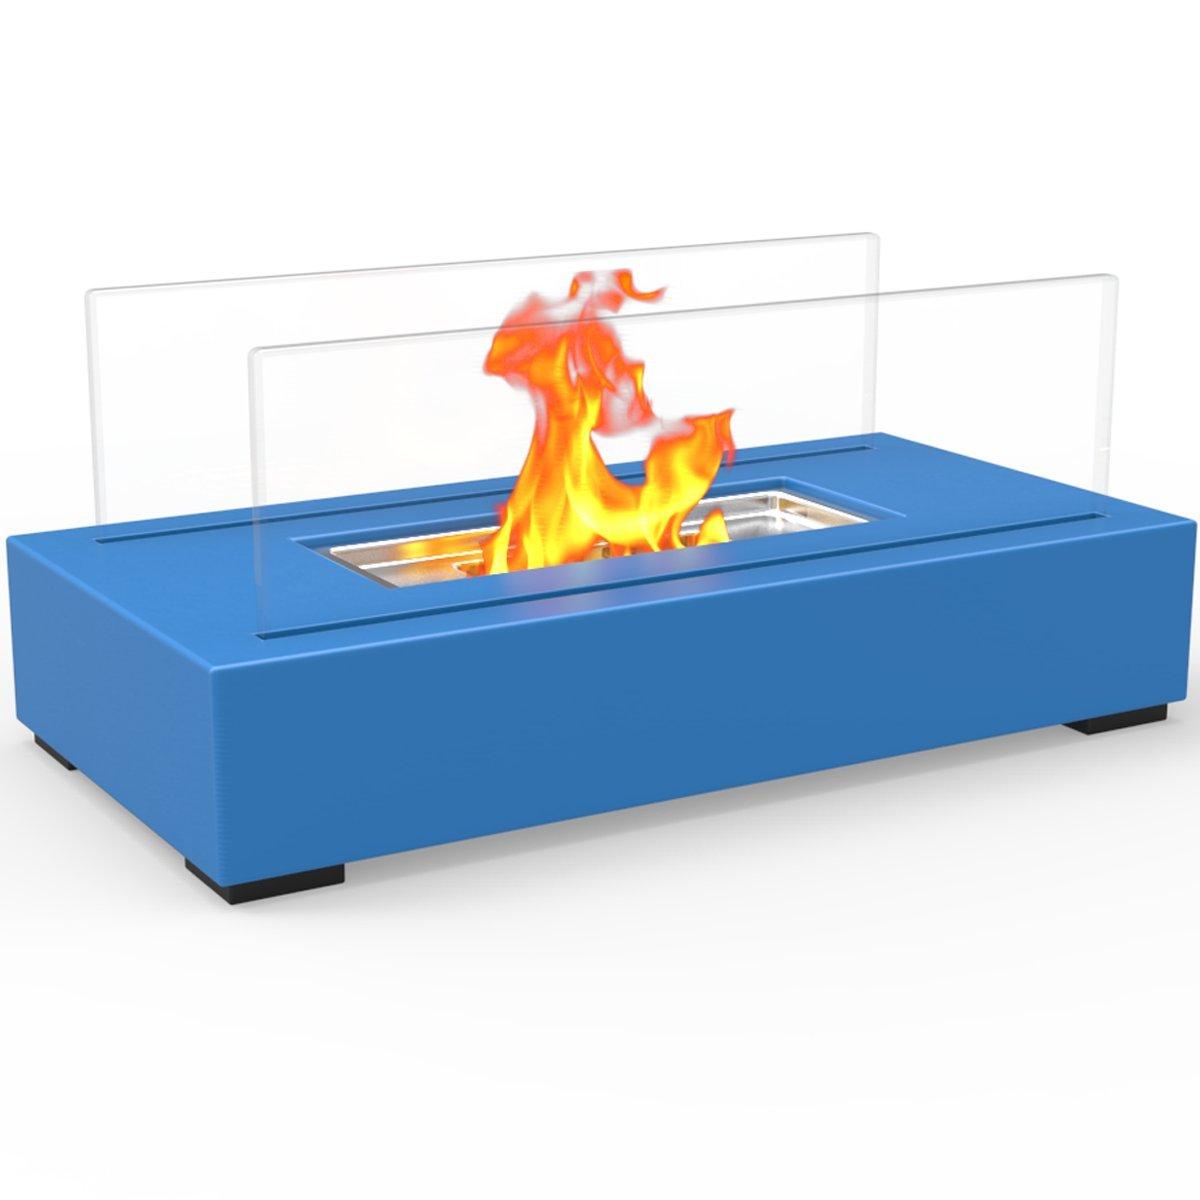 Peachy Buy Regal Flame Utopia Ventless Indoor Outdoor Fire Pit Download Free Architecture Designs Scobabritishbridgeorg